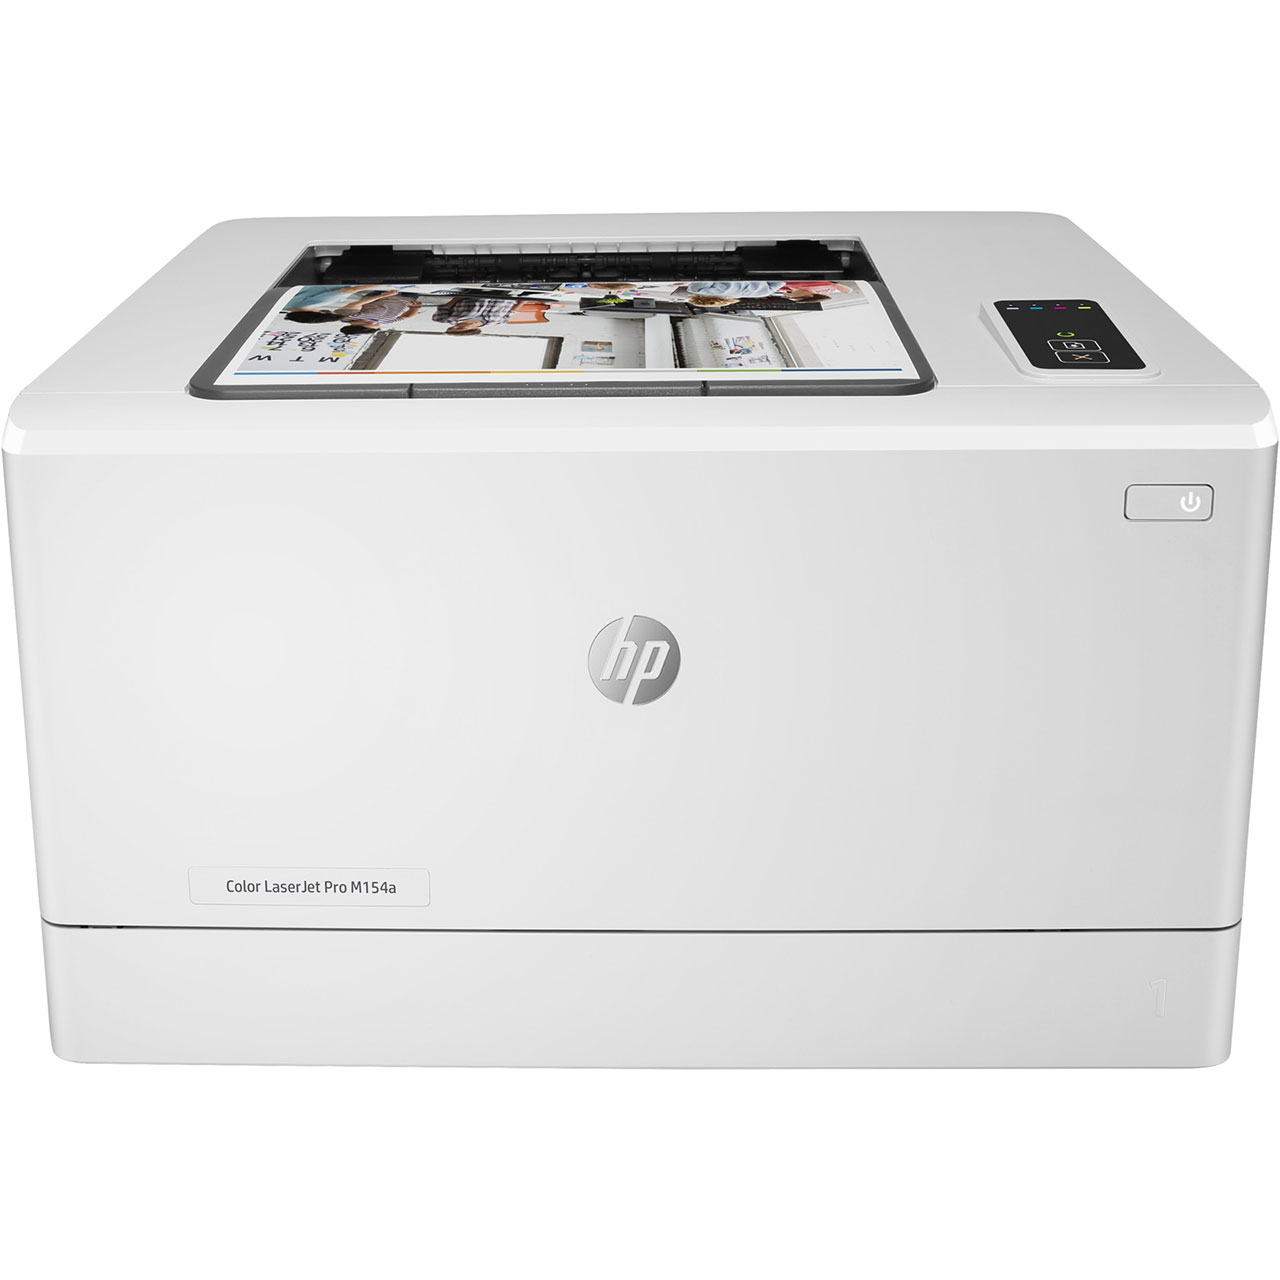 HP Color LaserJet Pro M154a toner